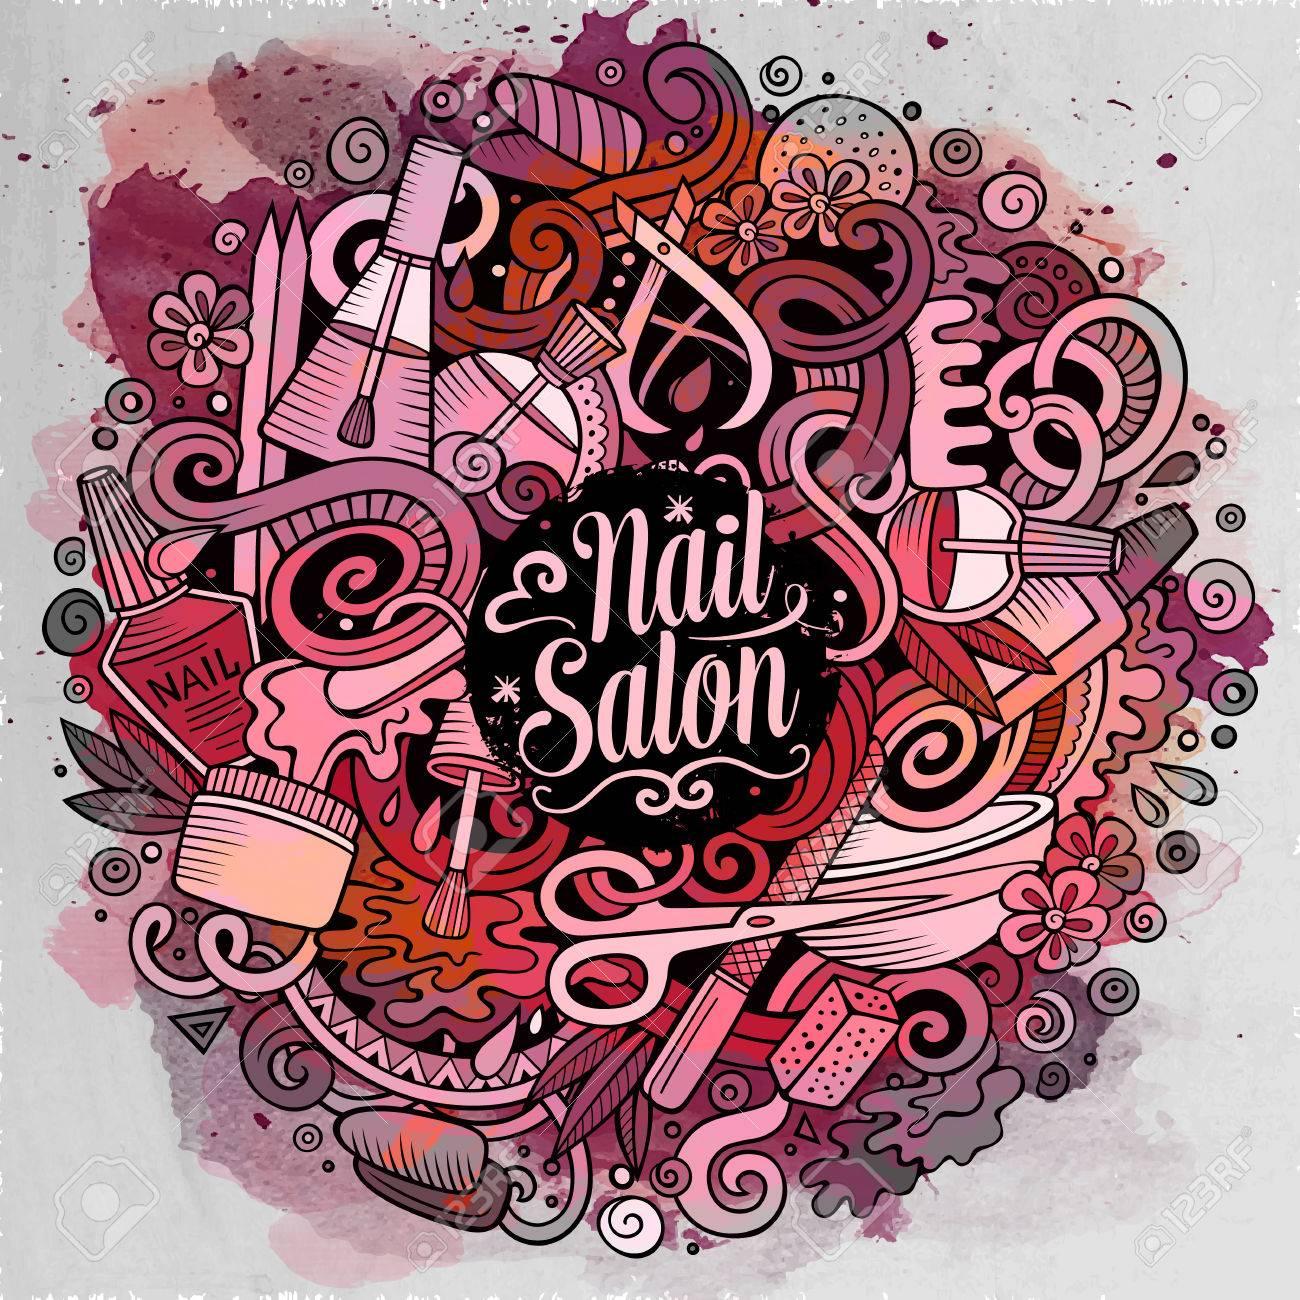 Cartoon Cute Doodles Drawn Nail Salon Illustration. Watercolour ...